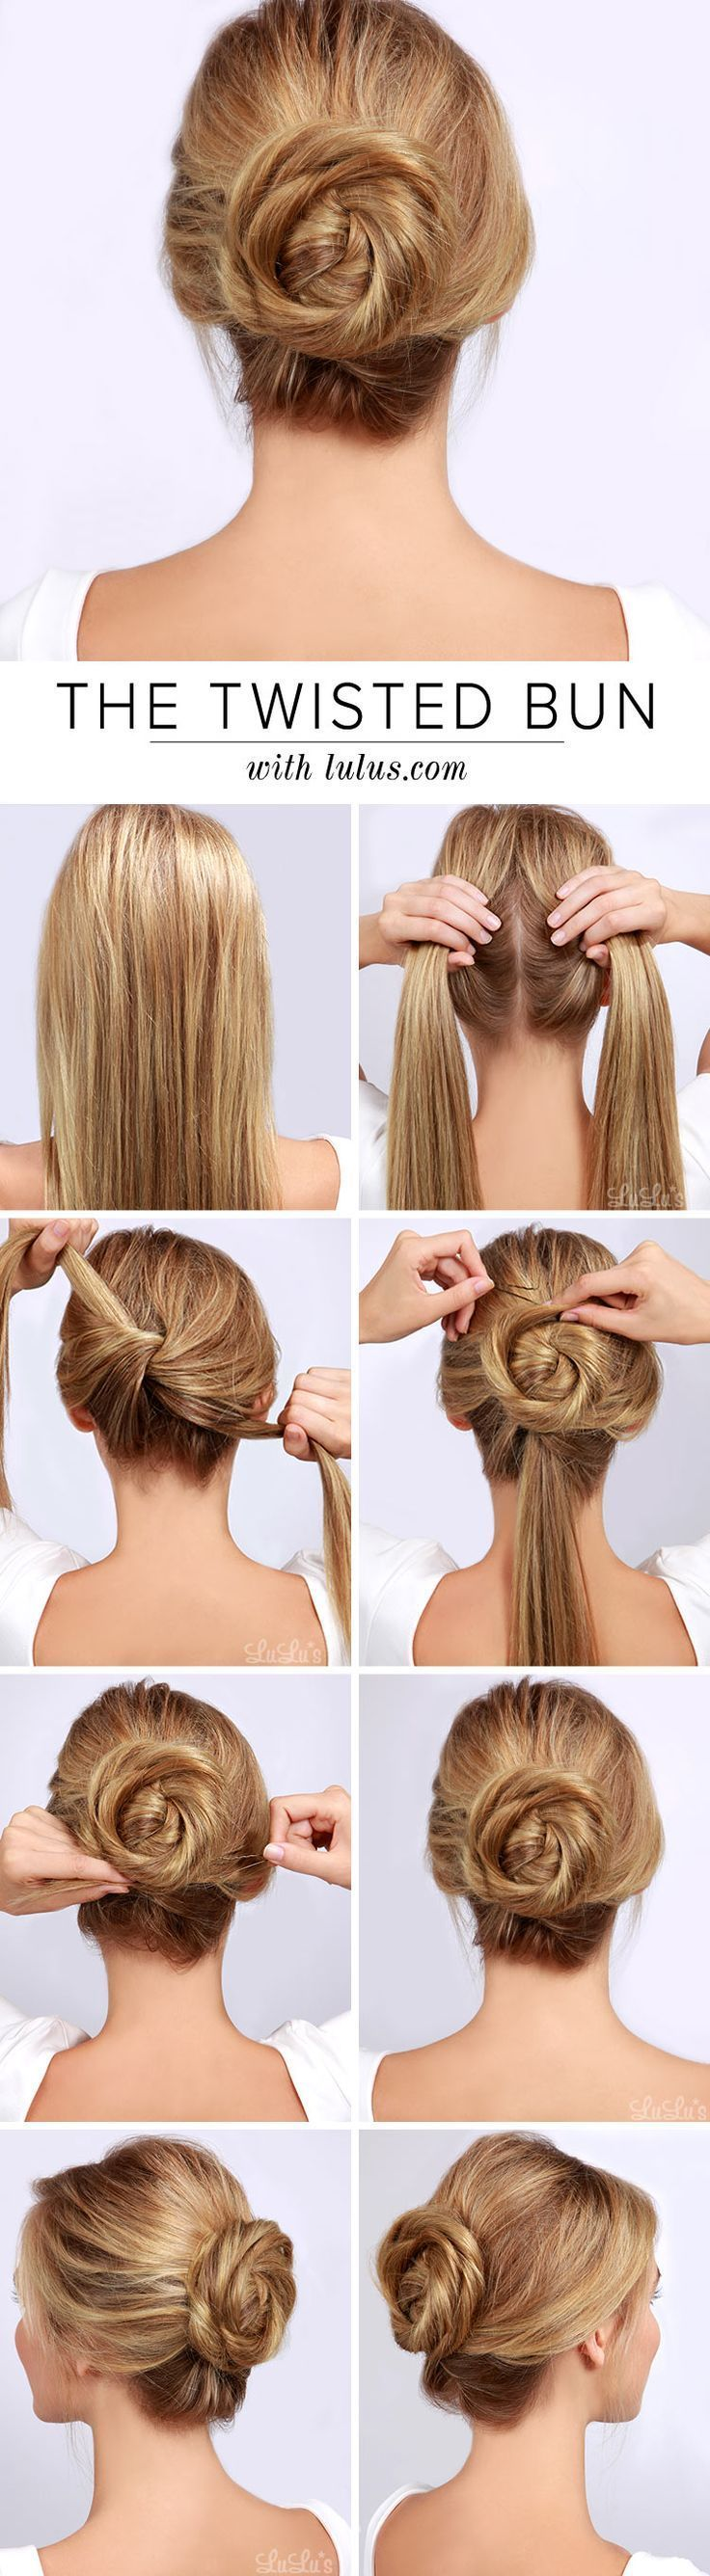 Lulus how to twisted bun hair tutorial bun hair tutorials bun best hairstyles ideas twisted bun hair tutorial offers a few simple steps to make your dream hair styl baditri Choice Image